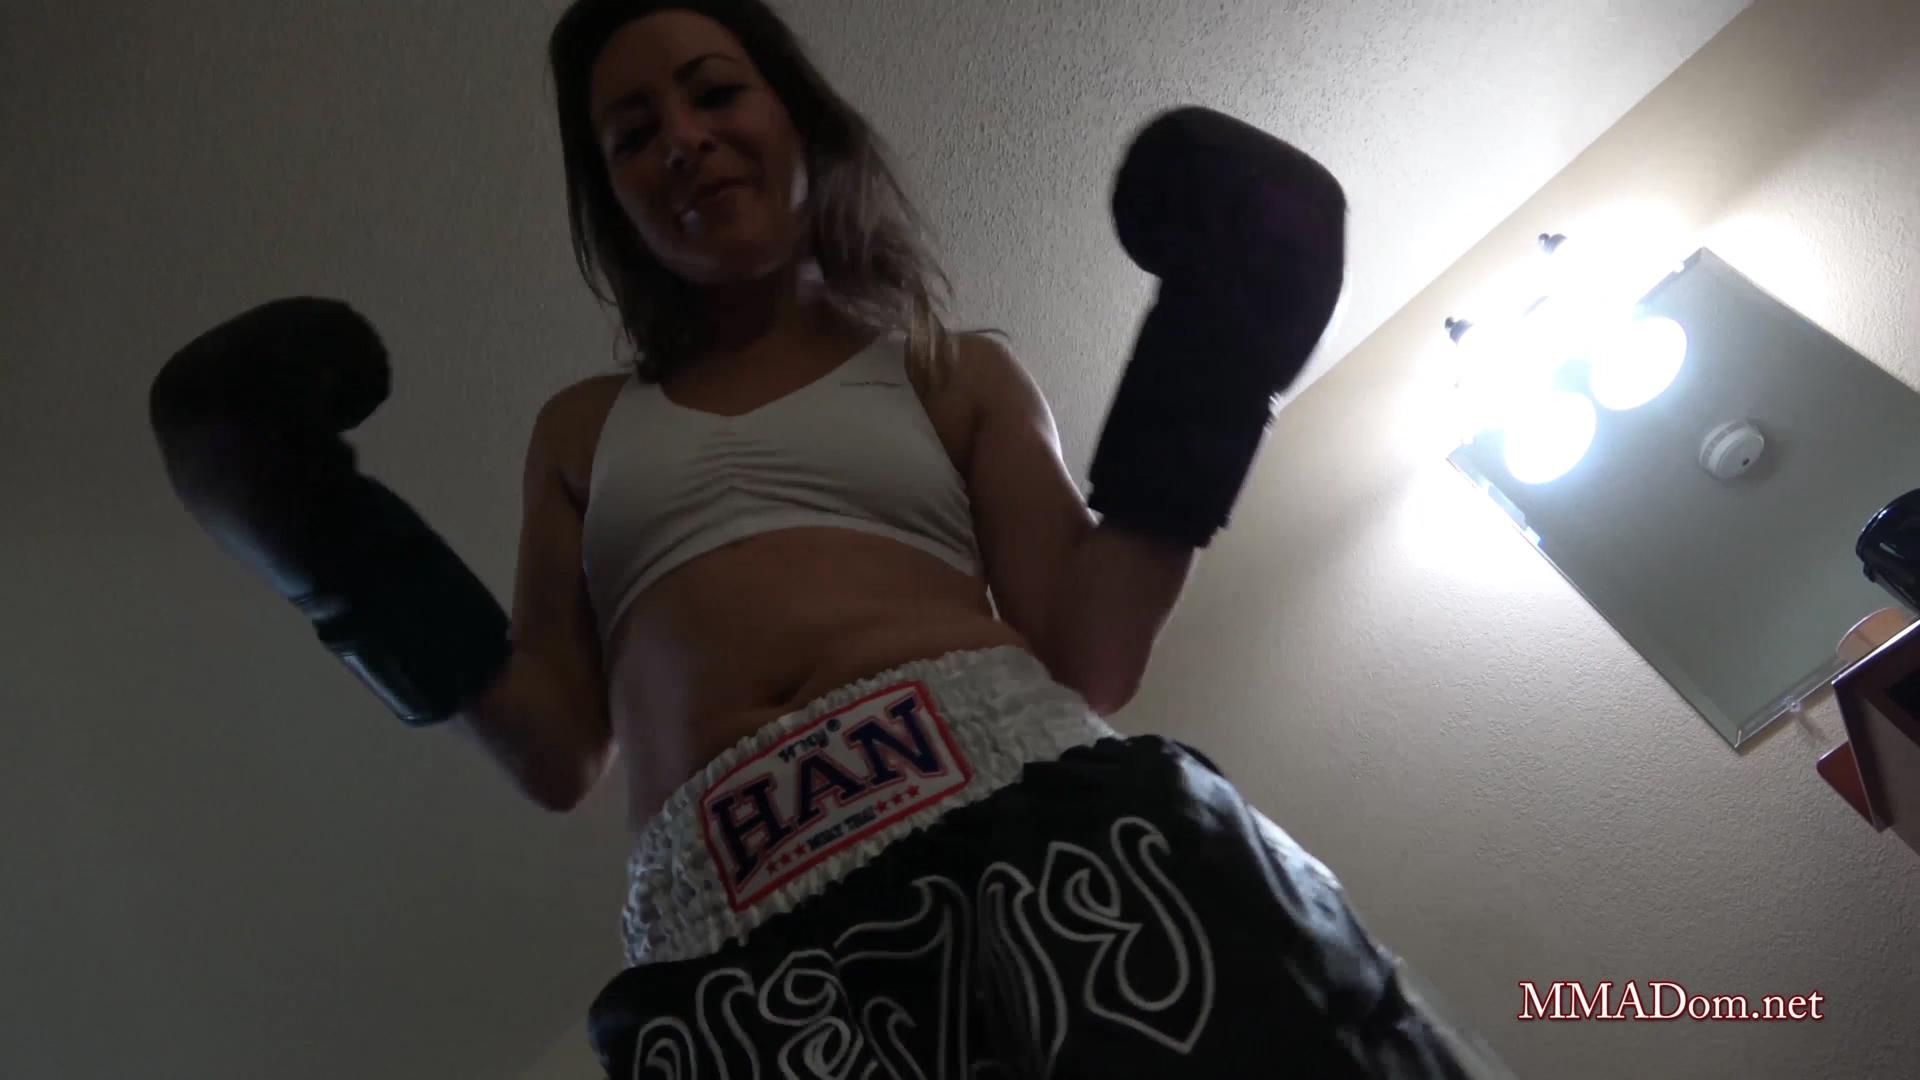 pandora_pov_boxing_beatdown.Still003